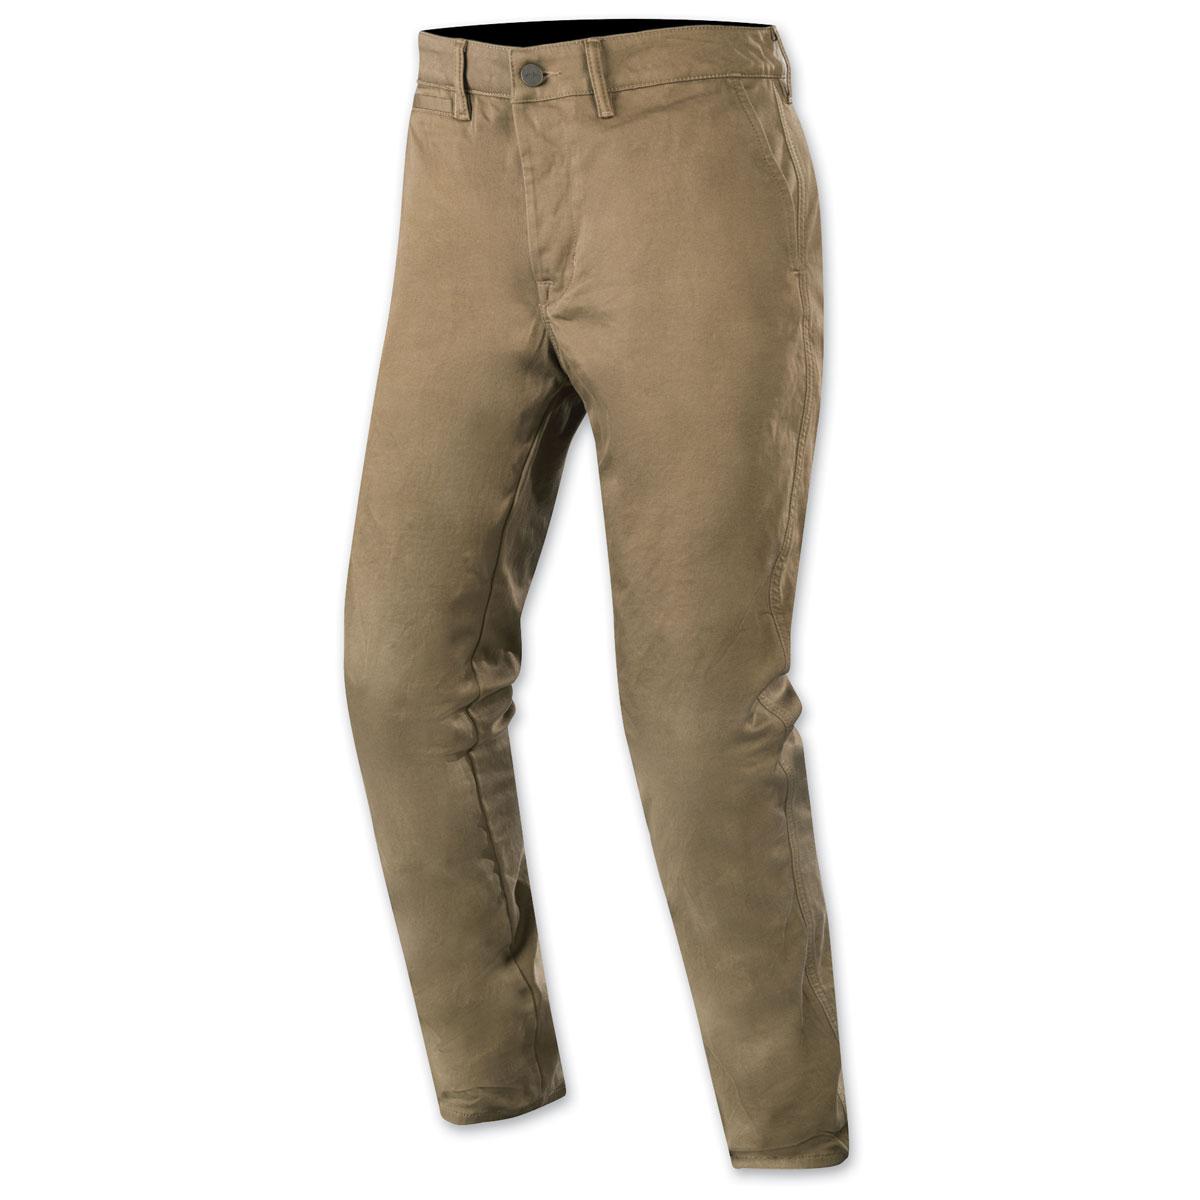 Alpinestars Men's Motochino Dark Khaki Pants